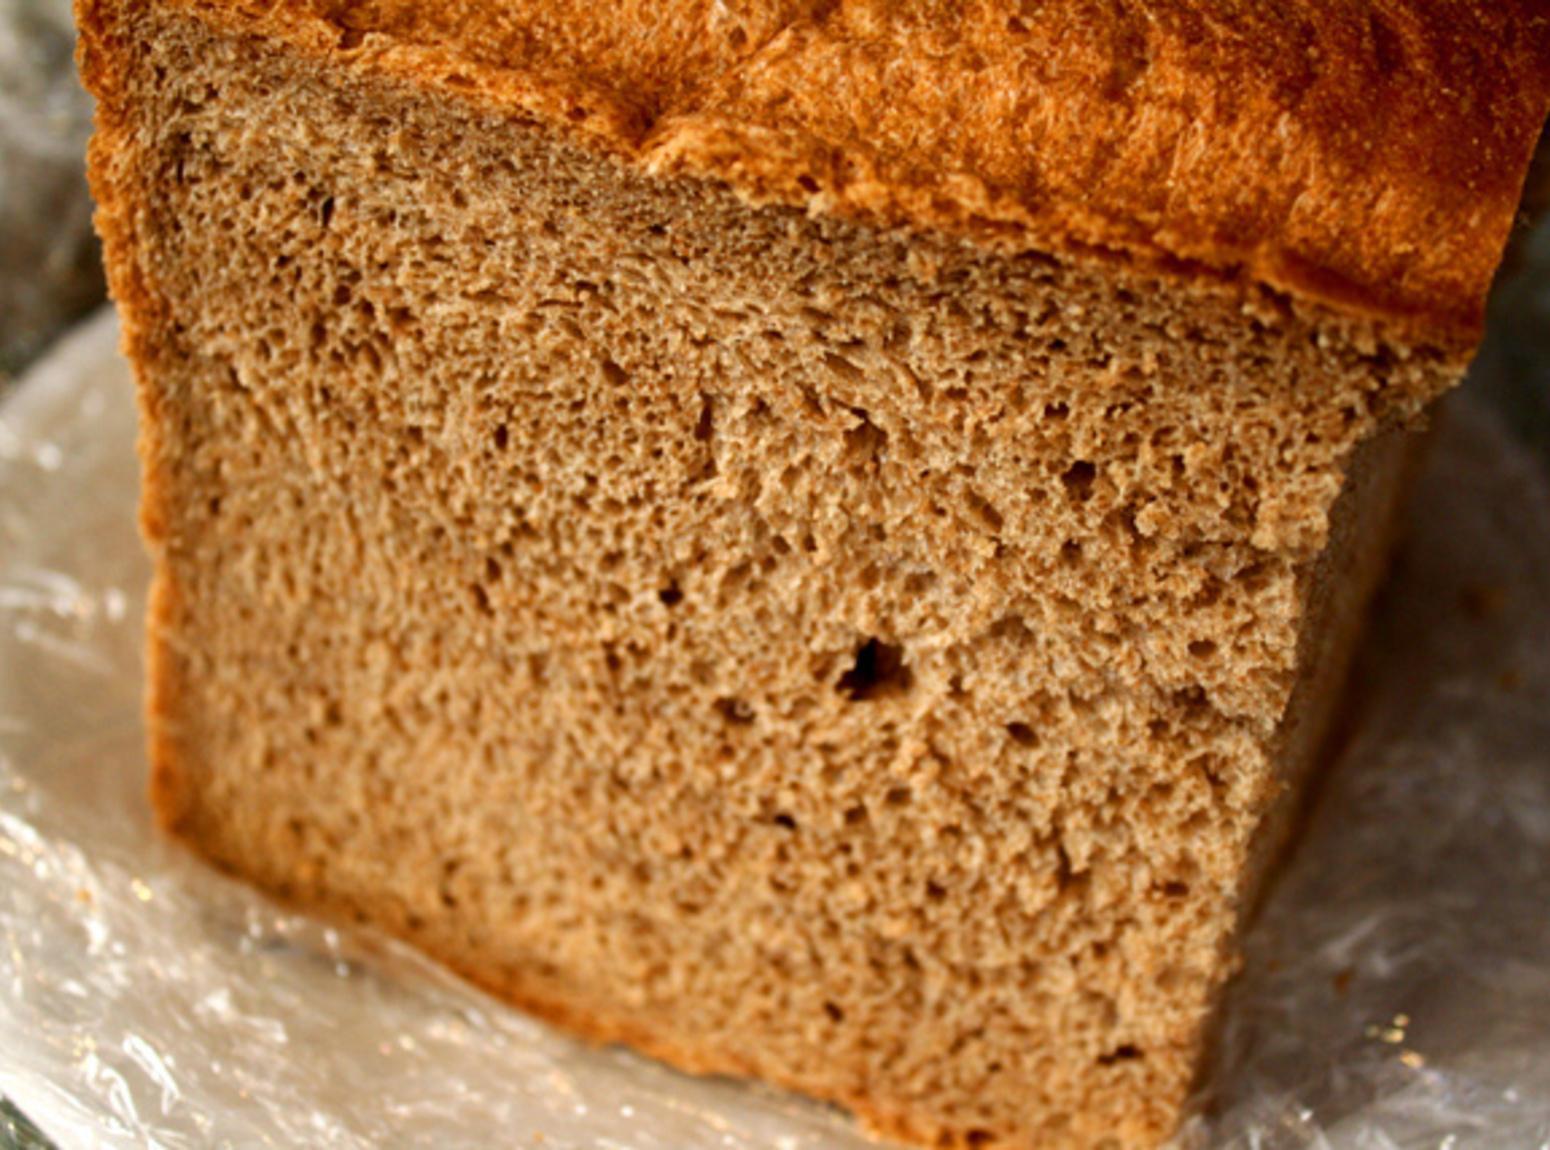 Whole Wheat Bread Machine Recipes  100 Whole Wheat Bread in a Bread Machine Recipe